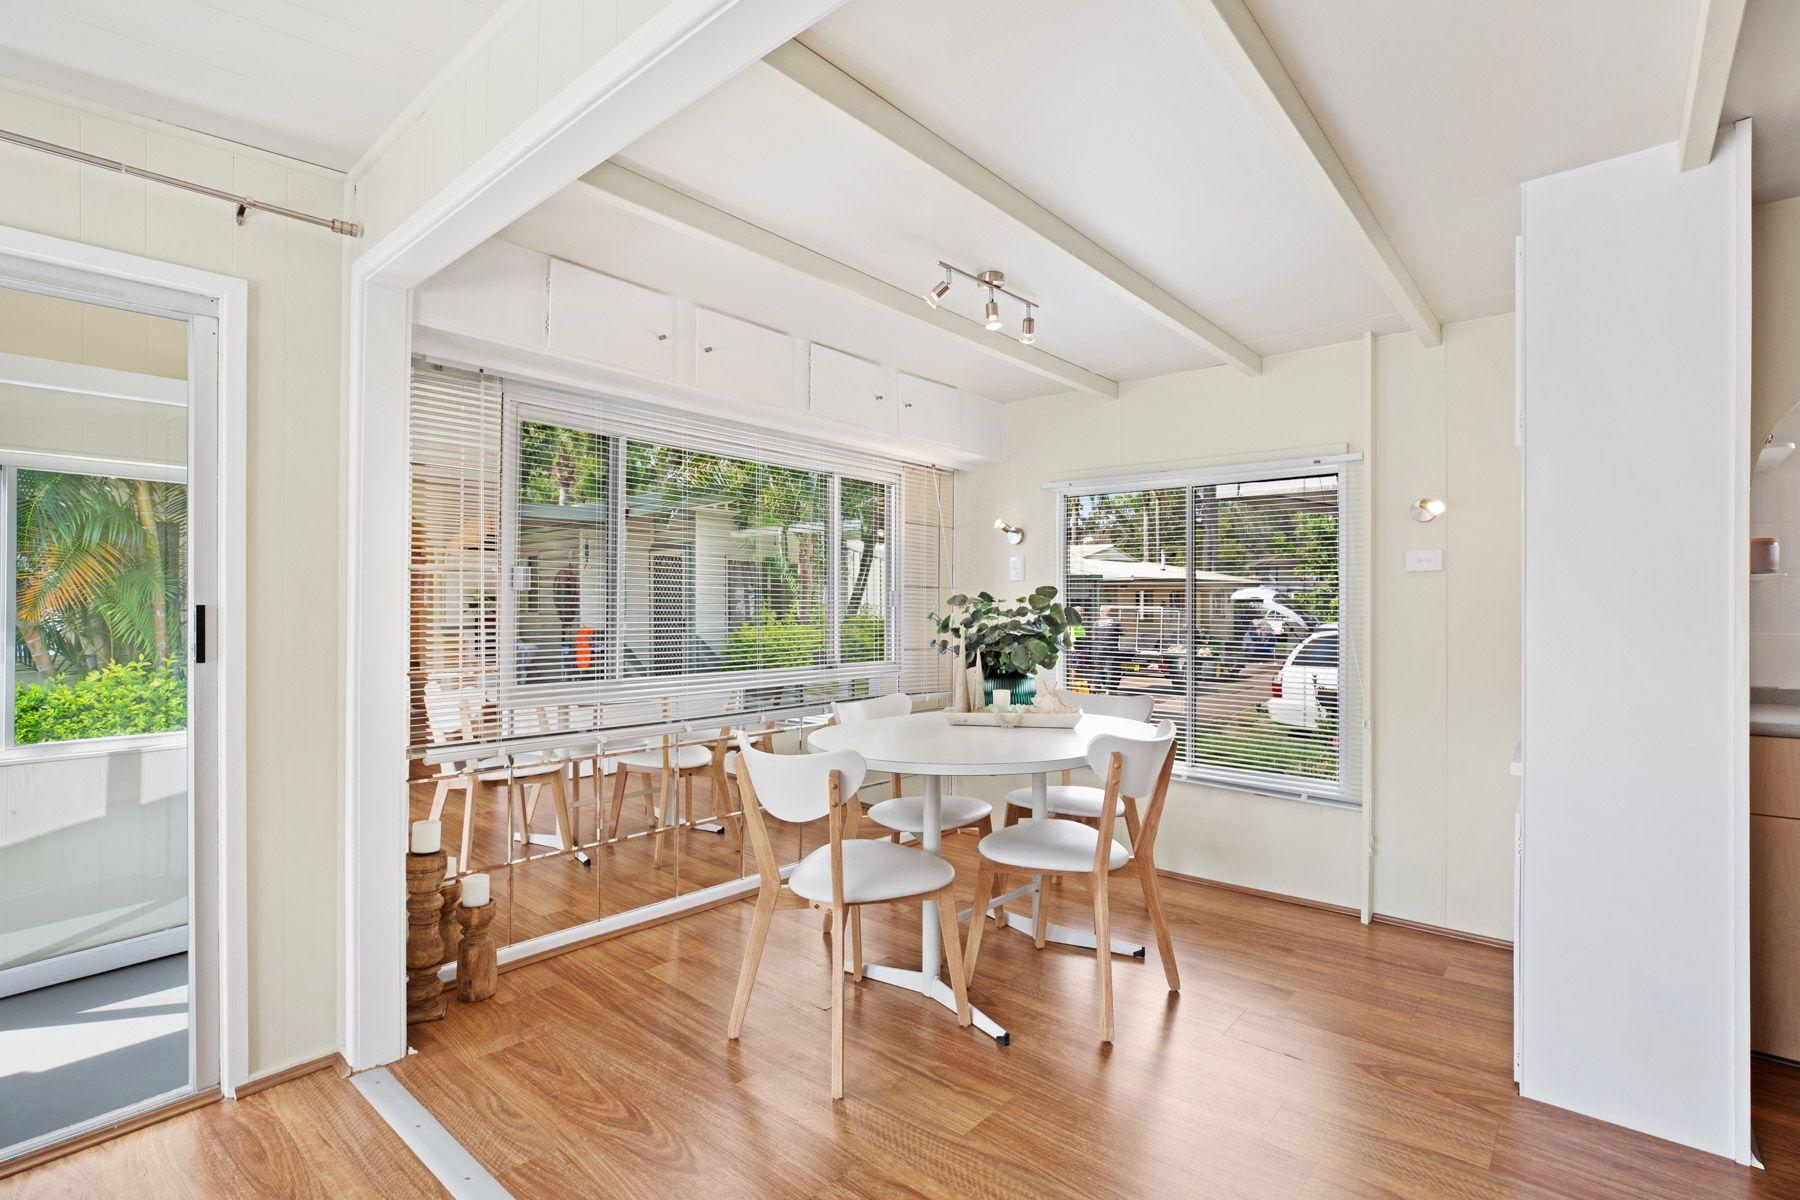 site 60/42 Ambrose street, Carey Bay, NSW 2283